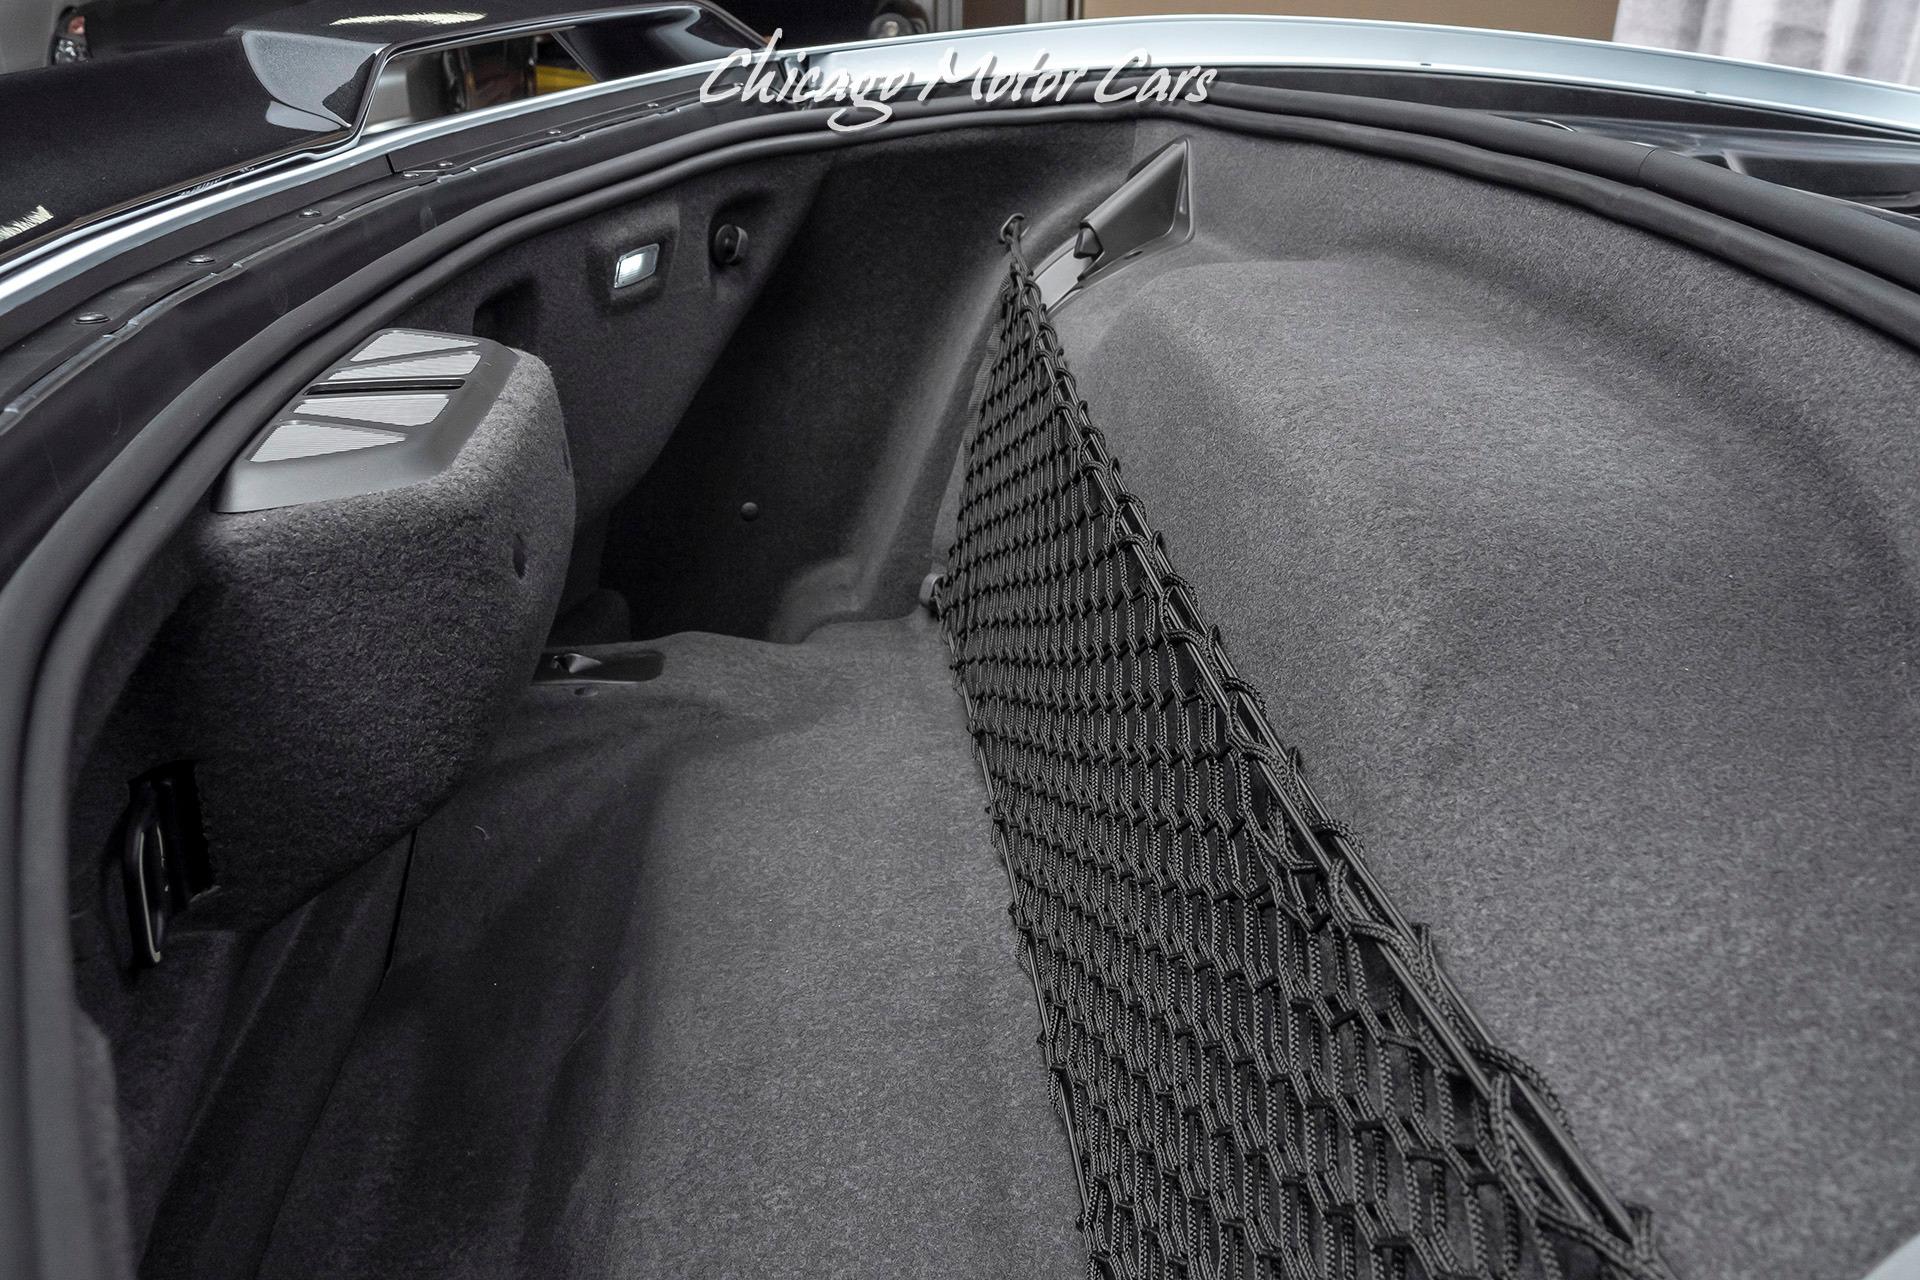 Used-2020-Chevrolet-Corvette-Stingray-C8-Stingray-2LT-Z51-Coupe---ONLY-100-MILES-LOADED